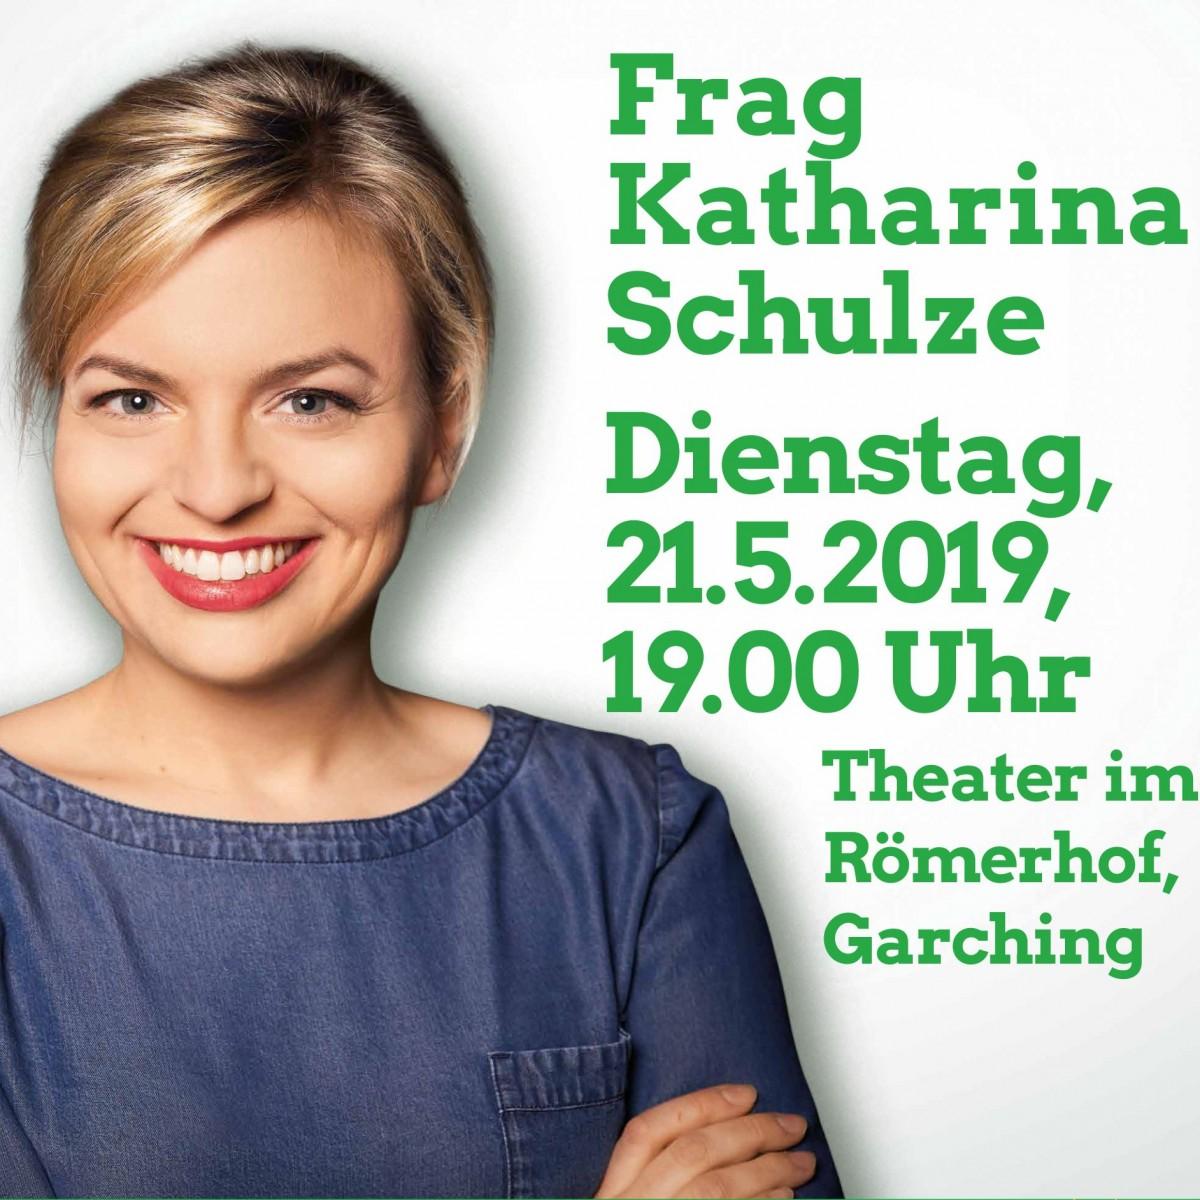 Veranstaltung - Frag Katharina Schulze